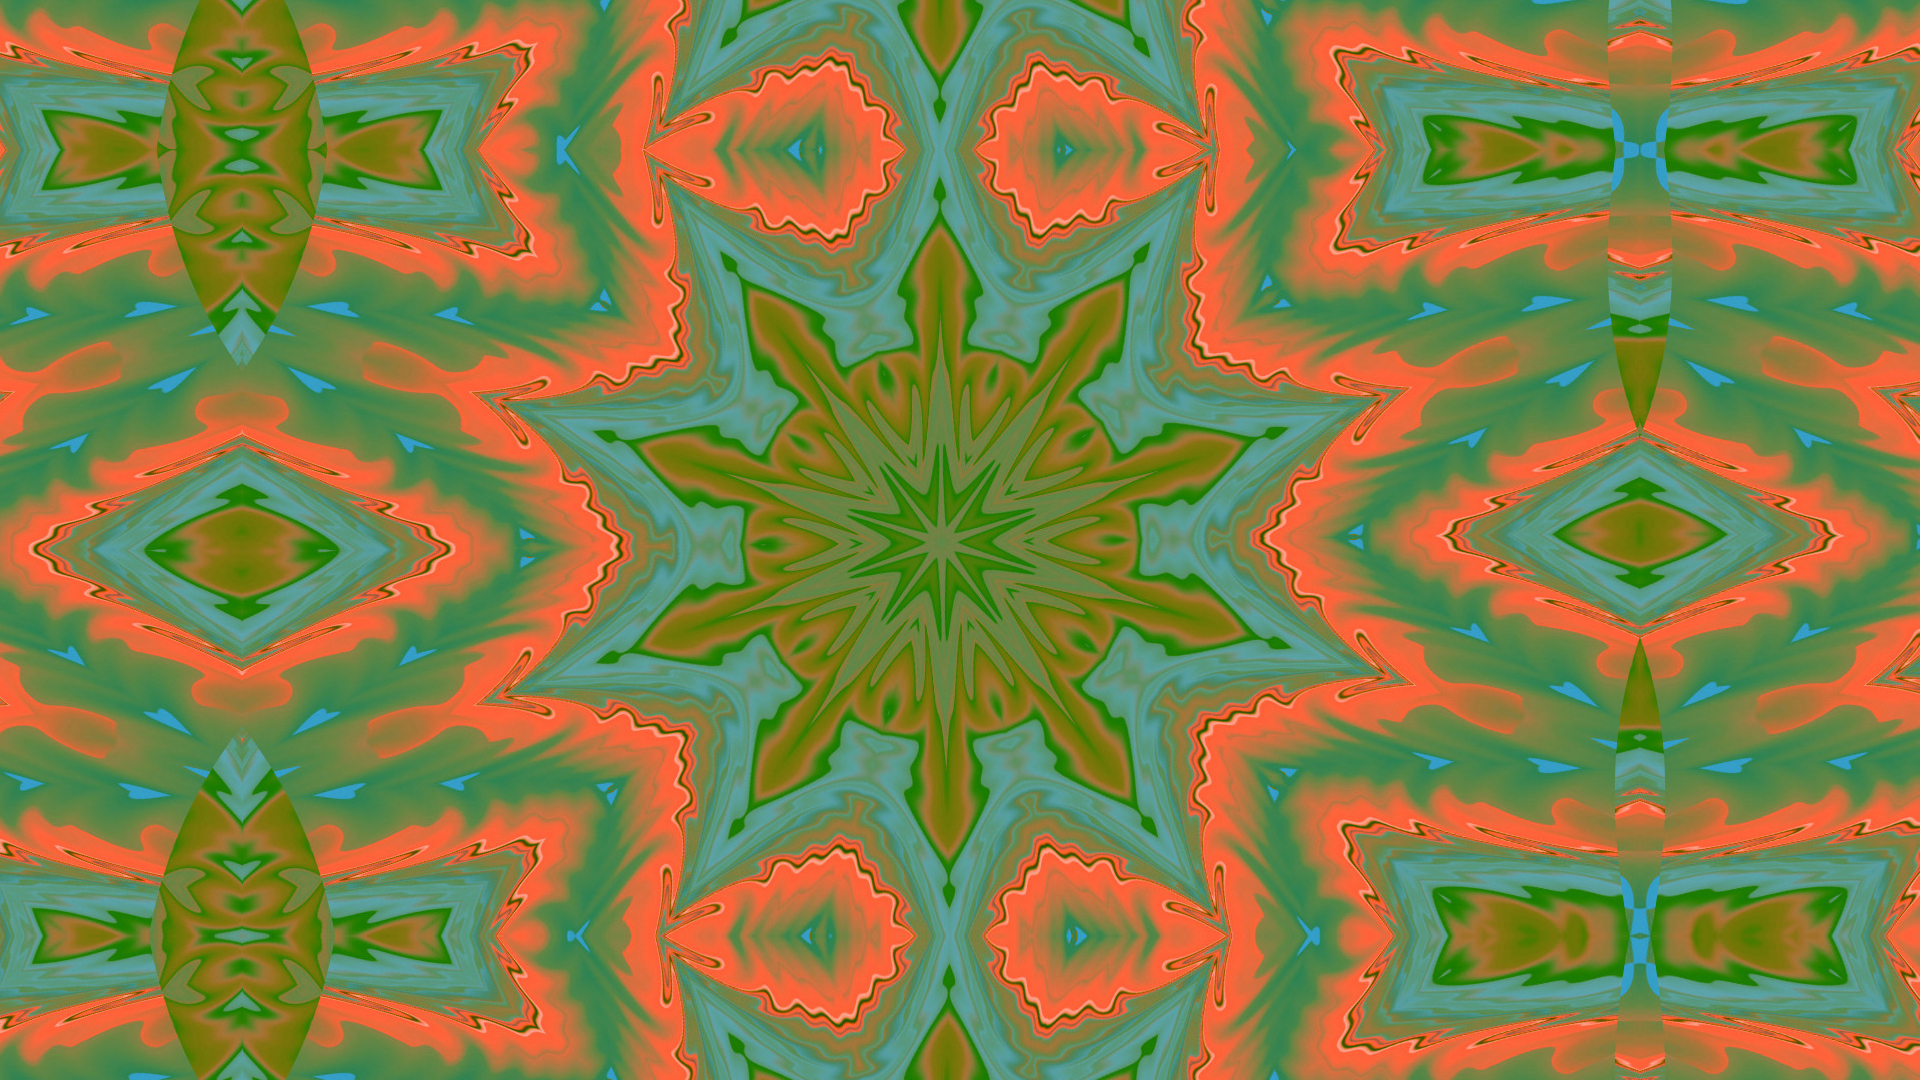 Artistic Colors Digital Art Green Kaleidoscope Pattern Psychedelic Orange Color 1920x1080